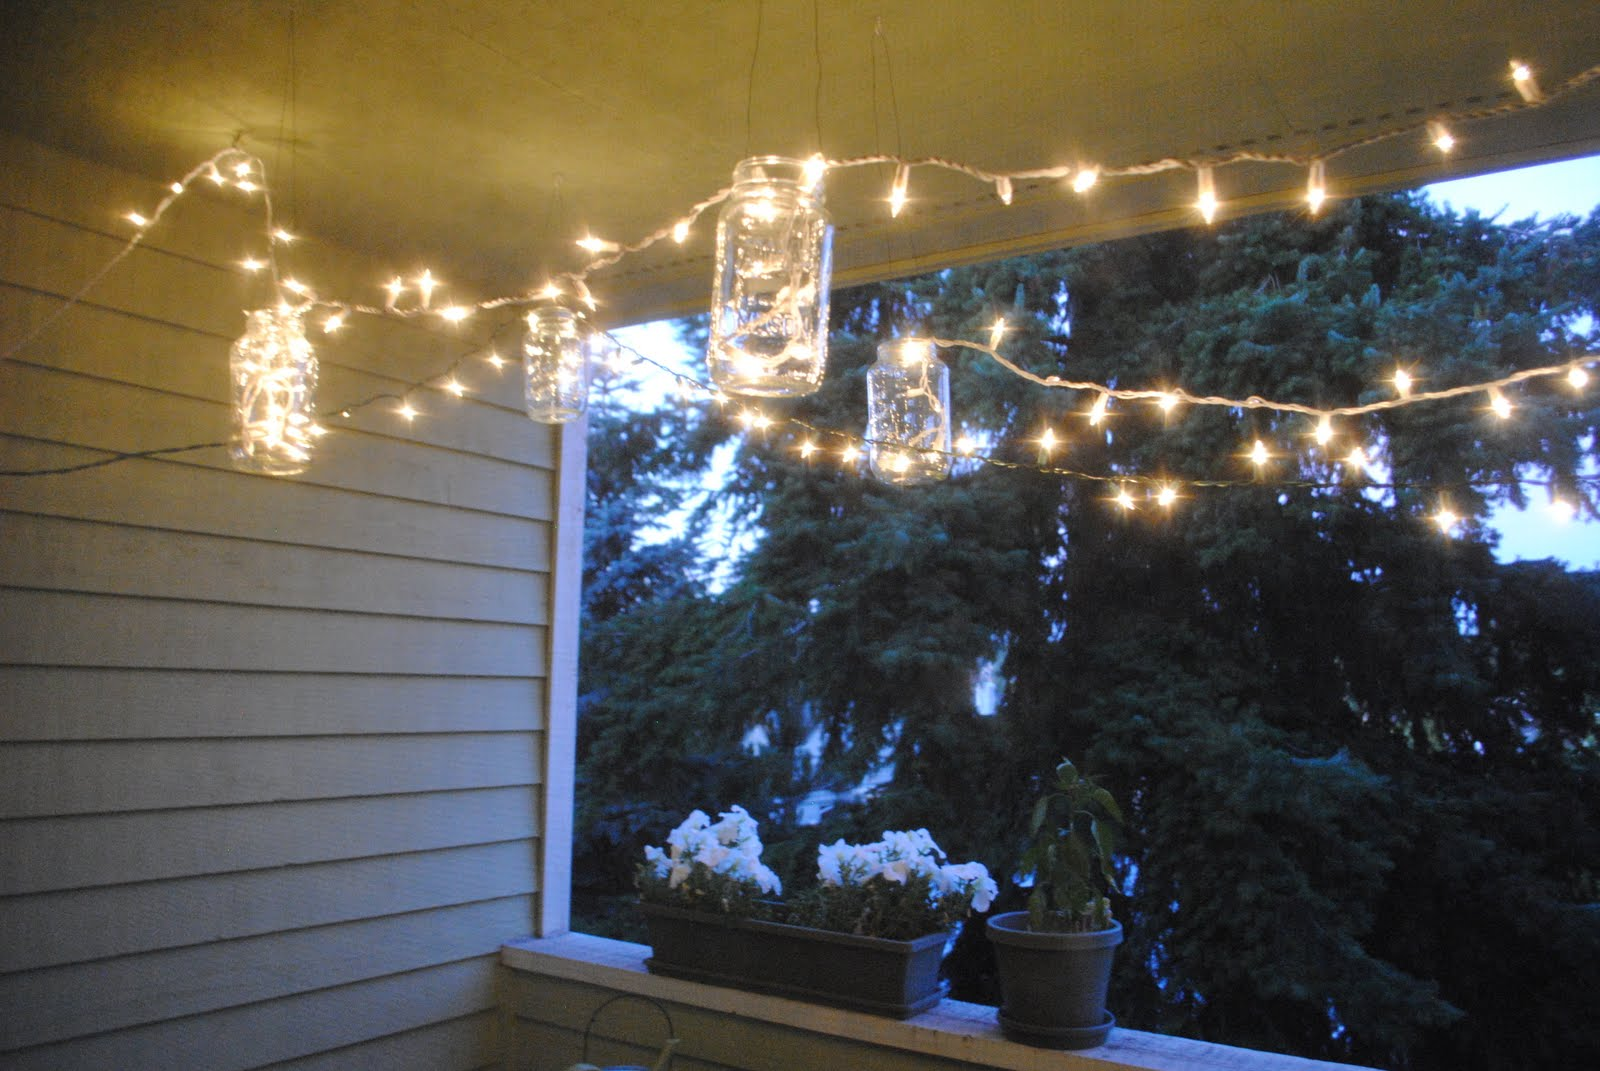 Our Emerald City: Deck Lighting: Lanterns & String Lights